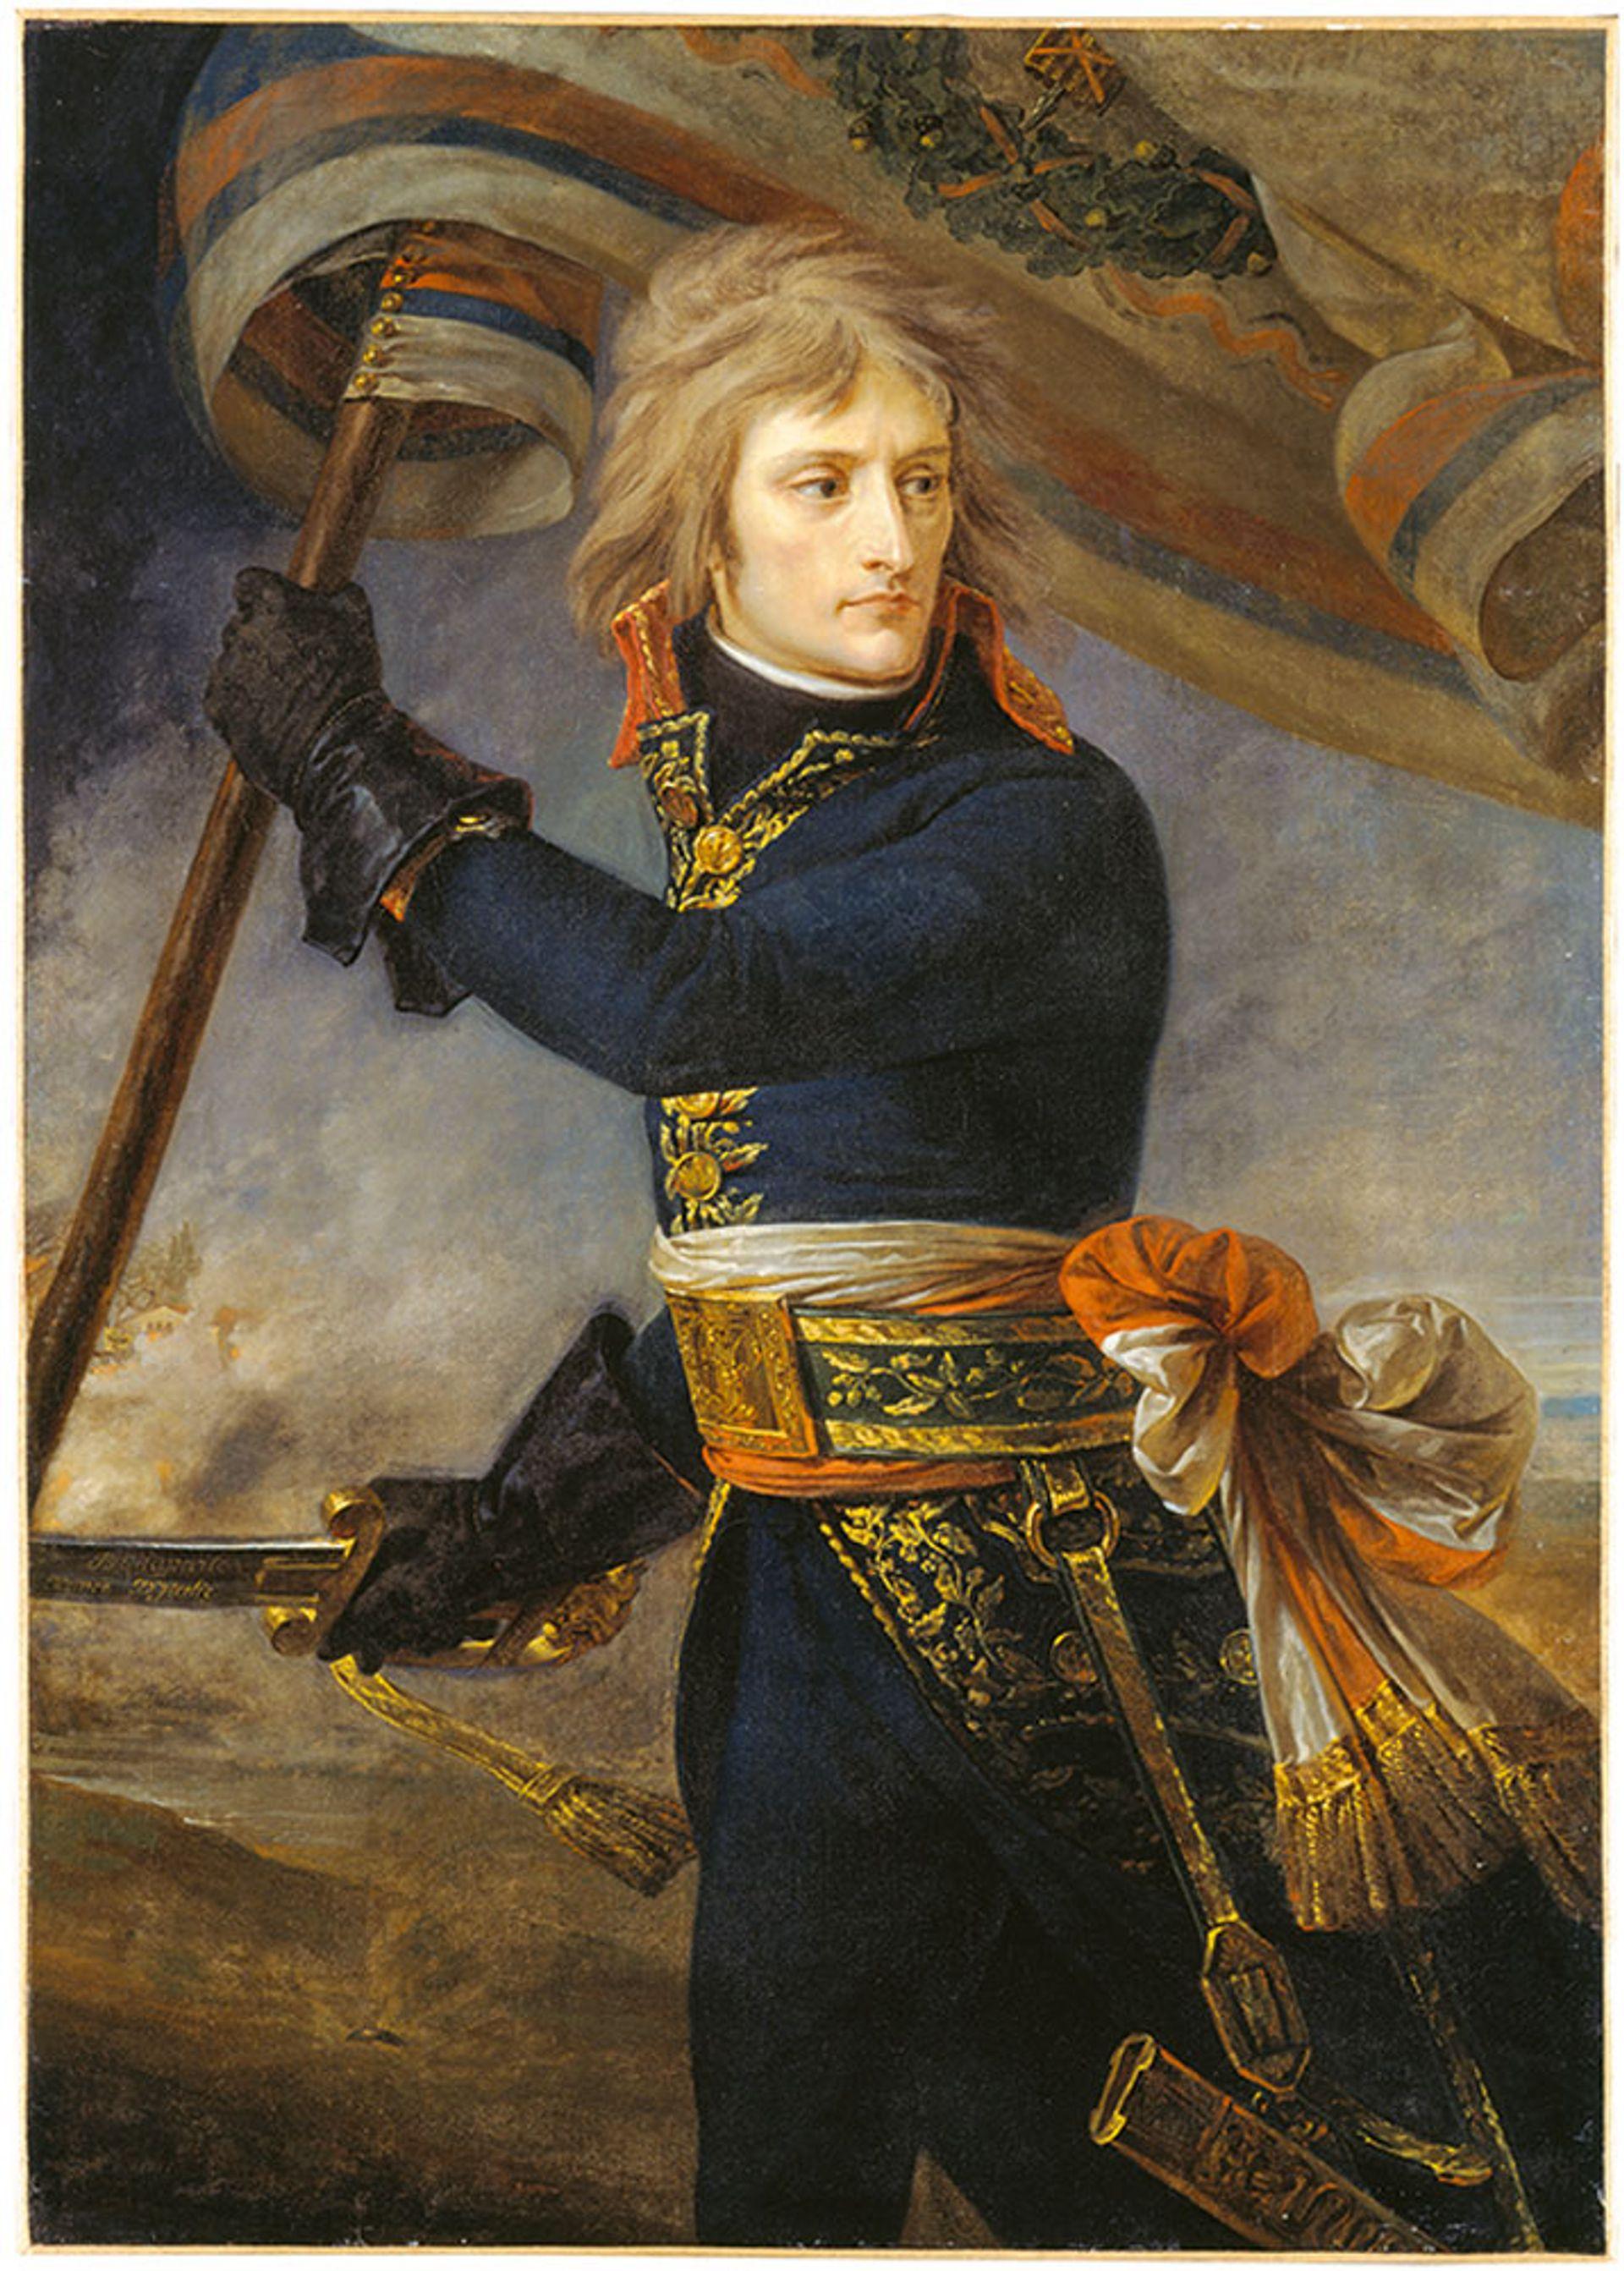 Bonaparte on the Bridge of Arcola, November 17, 1796 (1796-97) by Antoine-Jean Gros Josse Fine Art/Diomedia Images